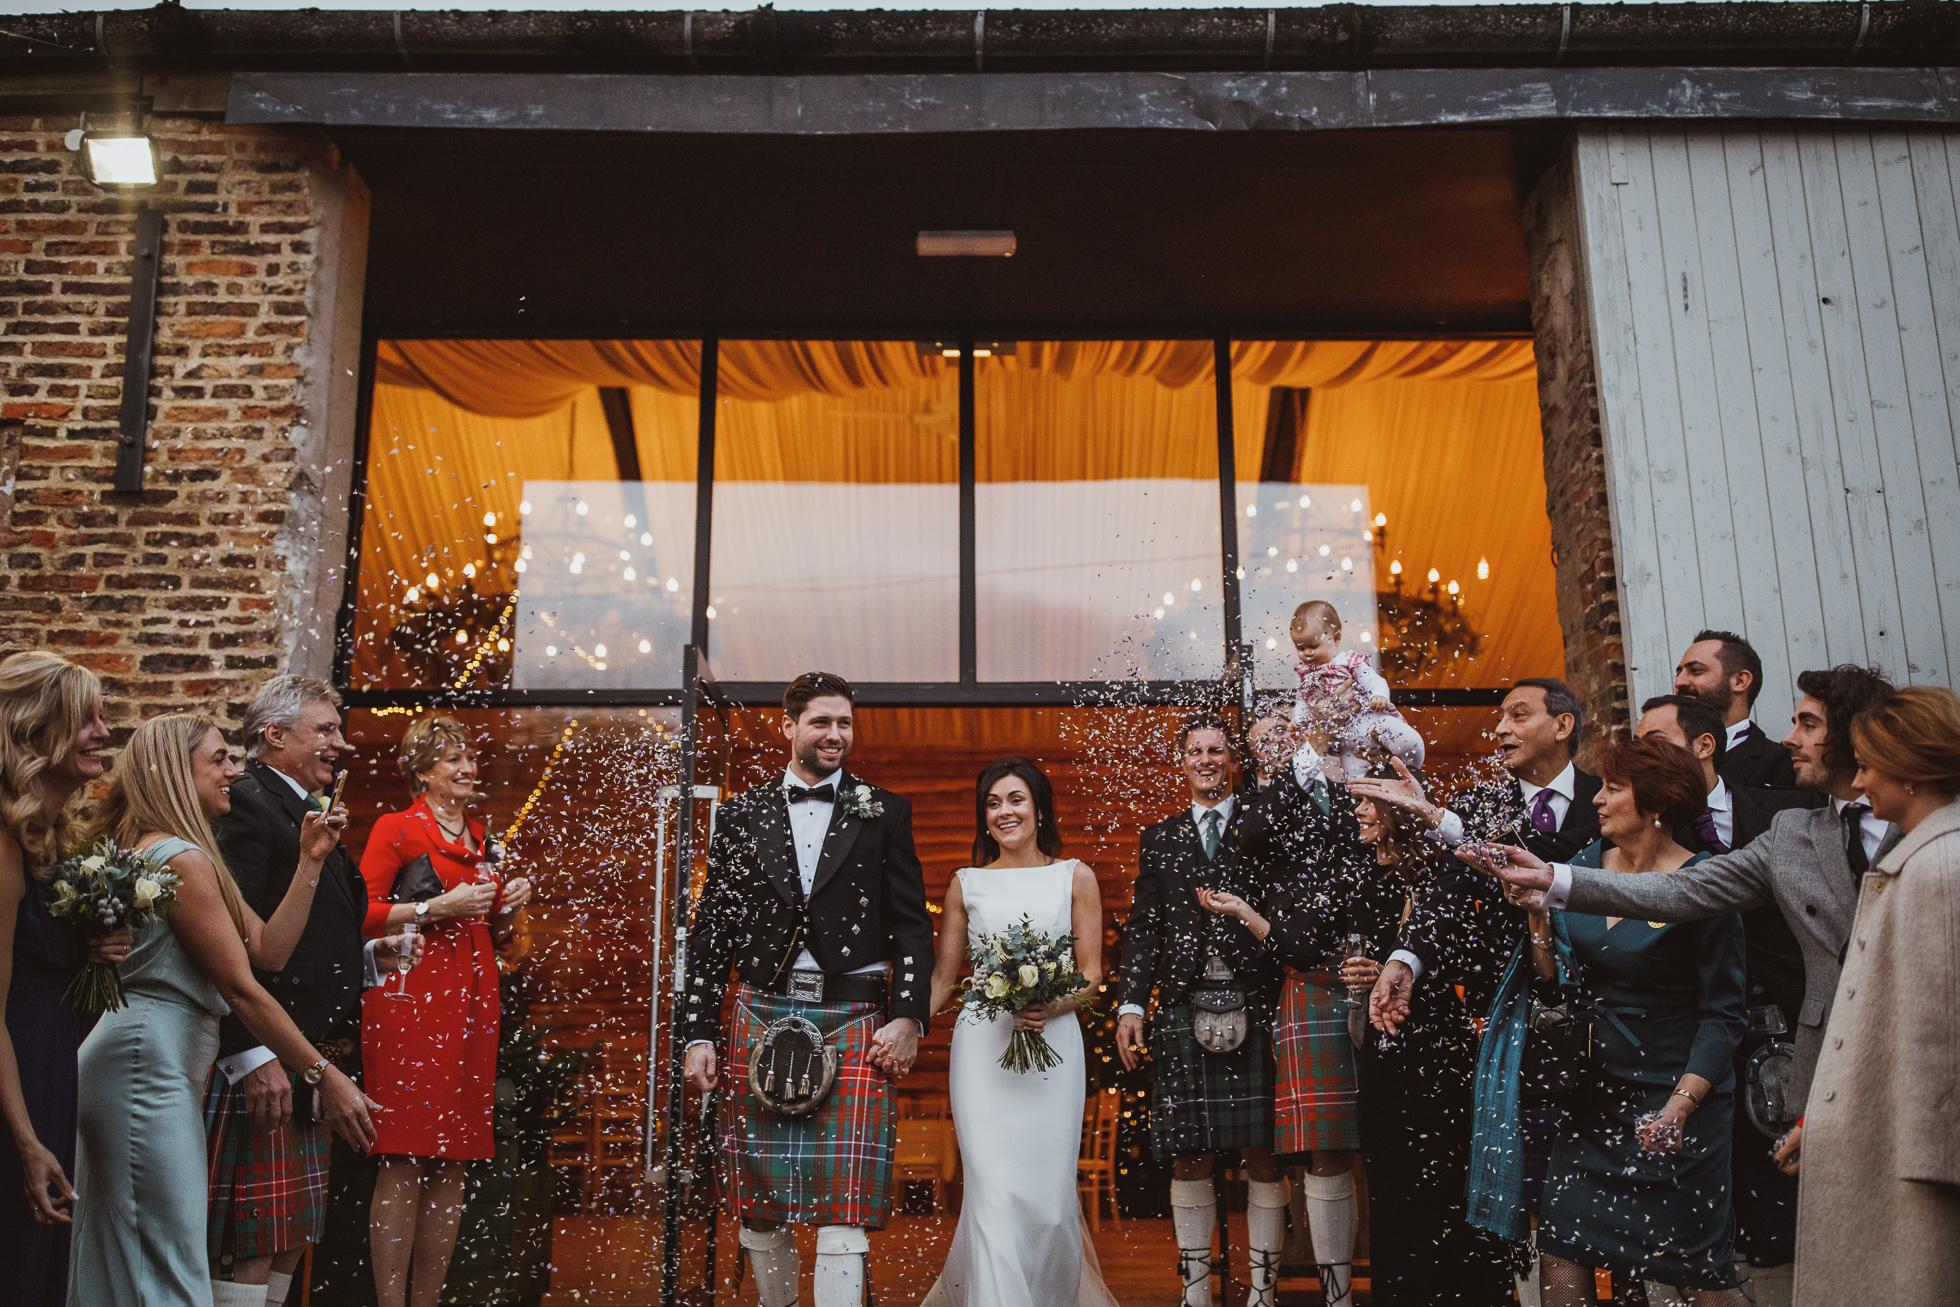 hornington_manor_wedding_photographer-61.jpg